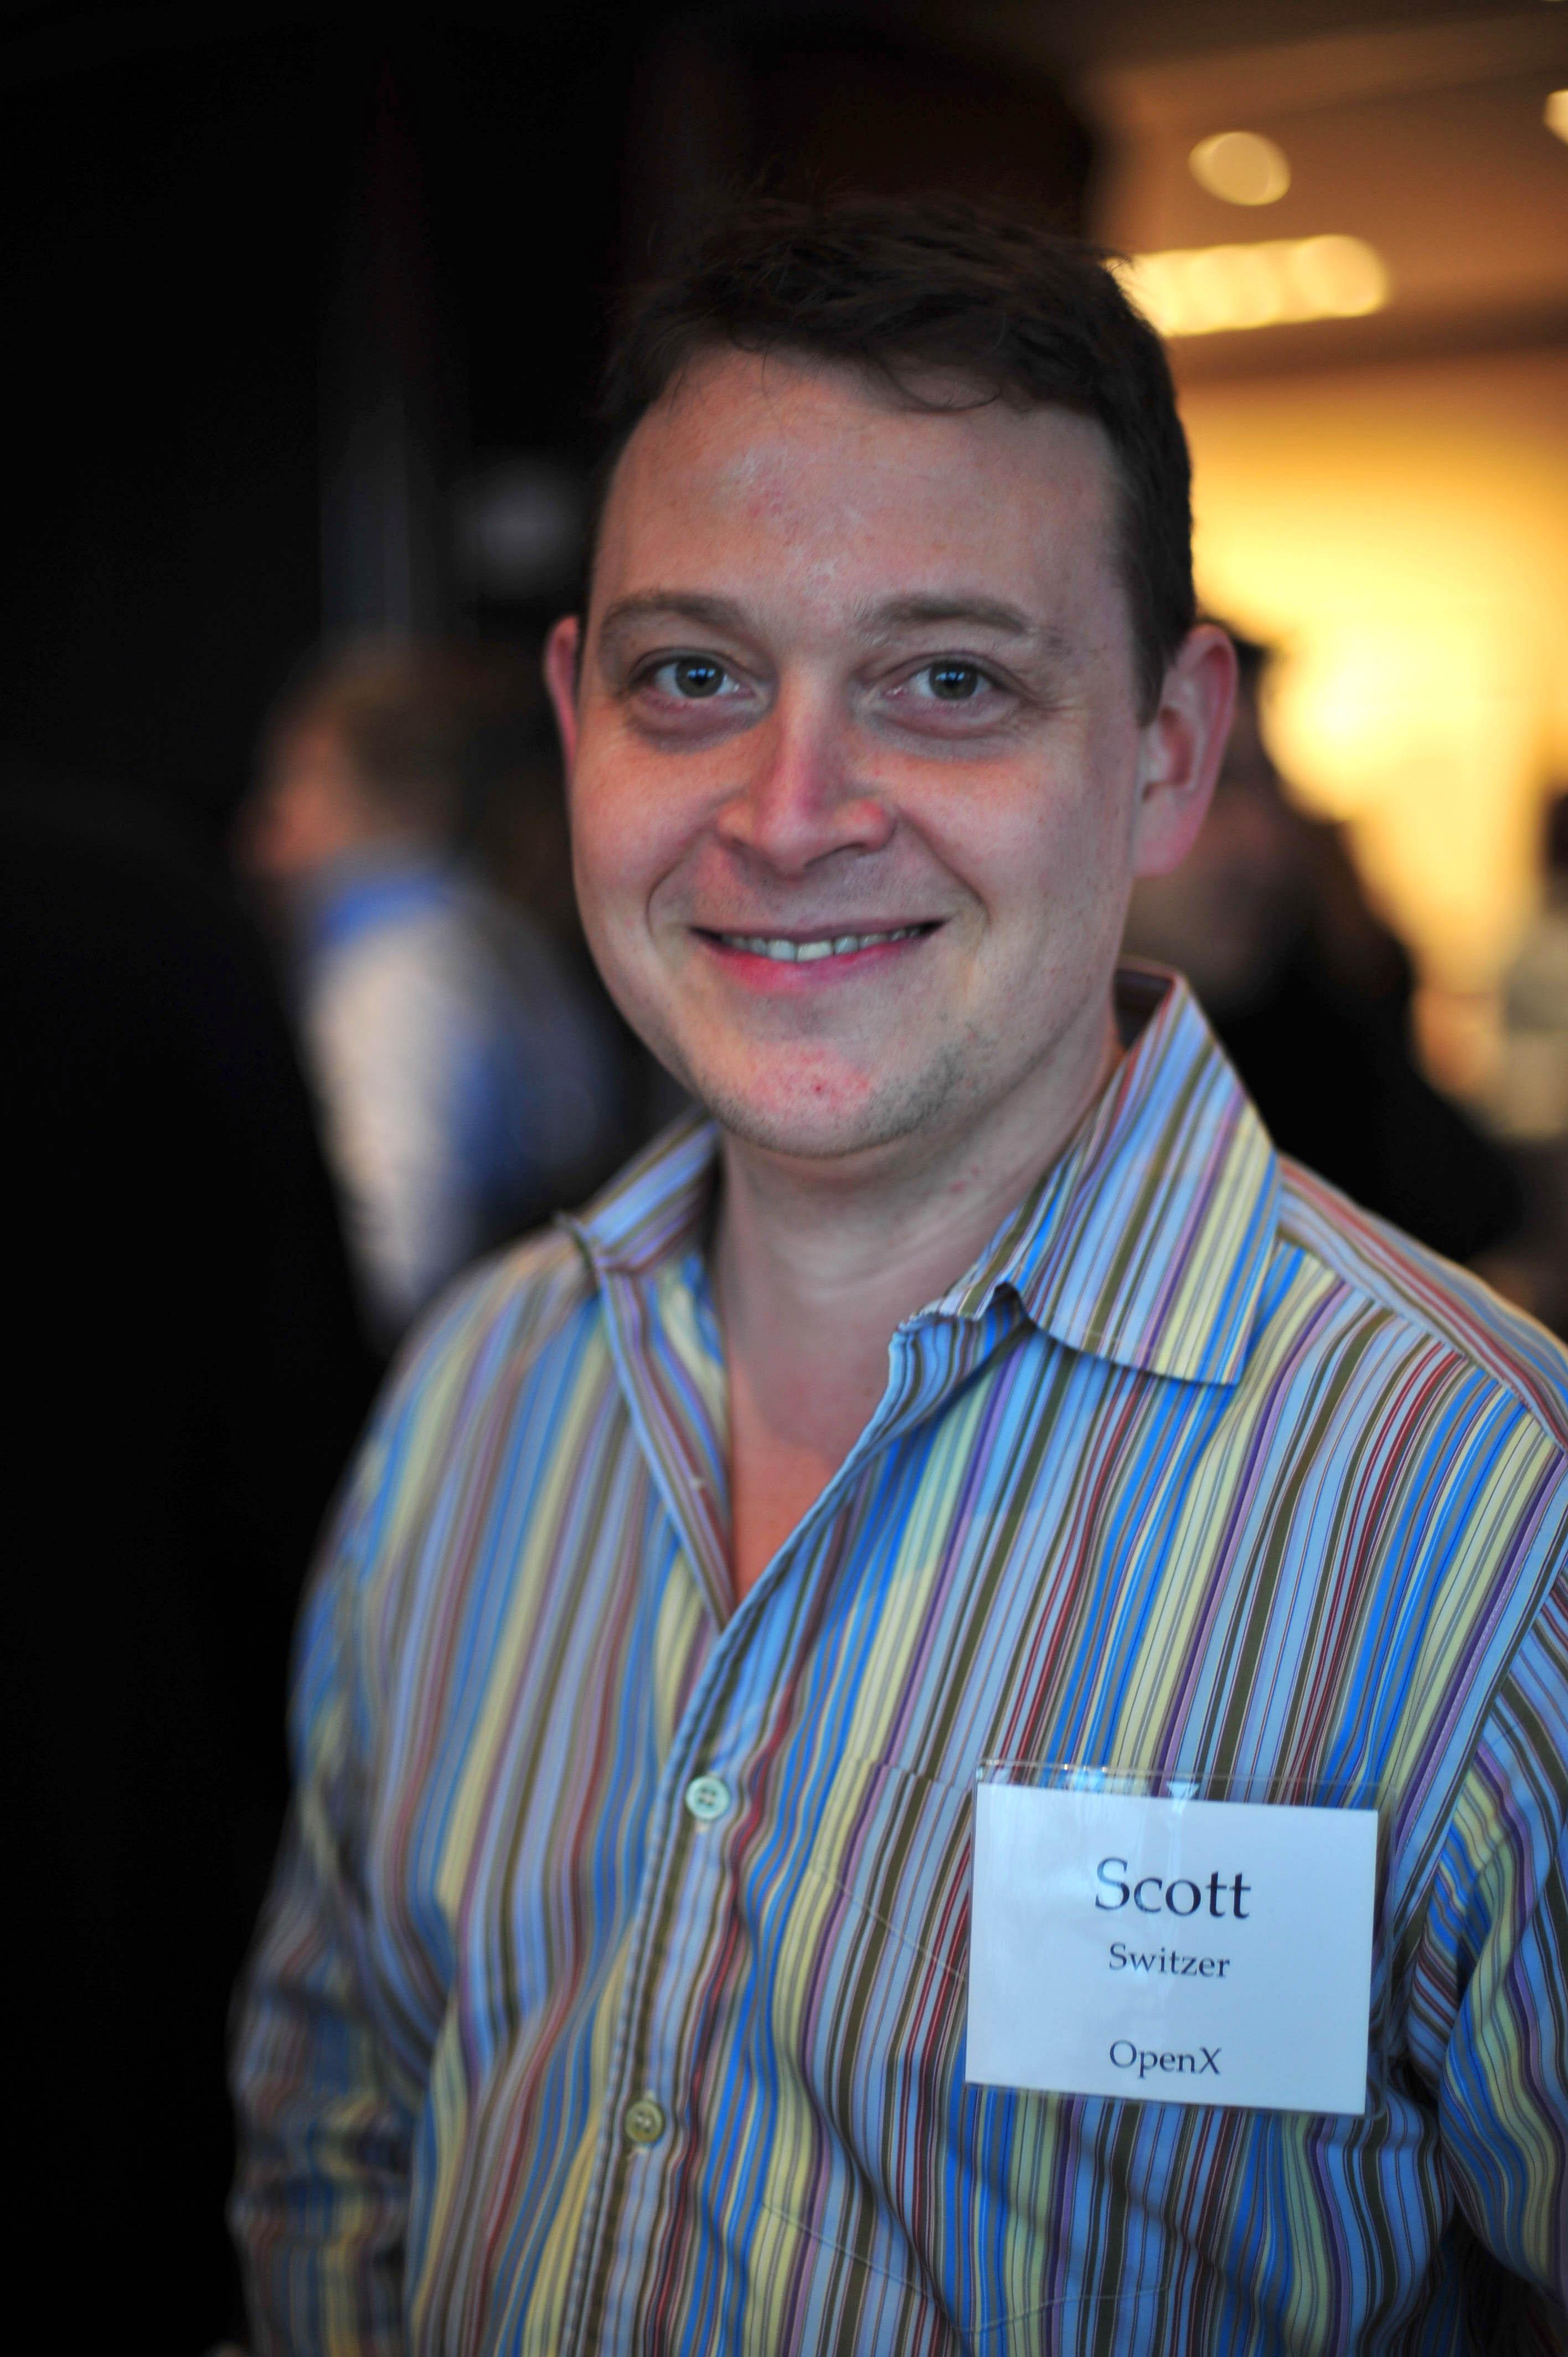 Scott Switzer1 Comment